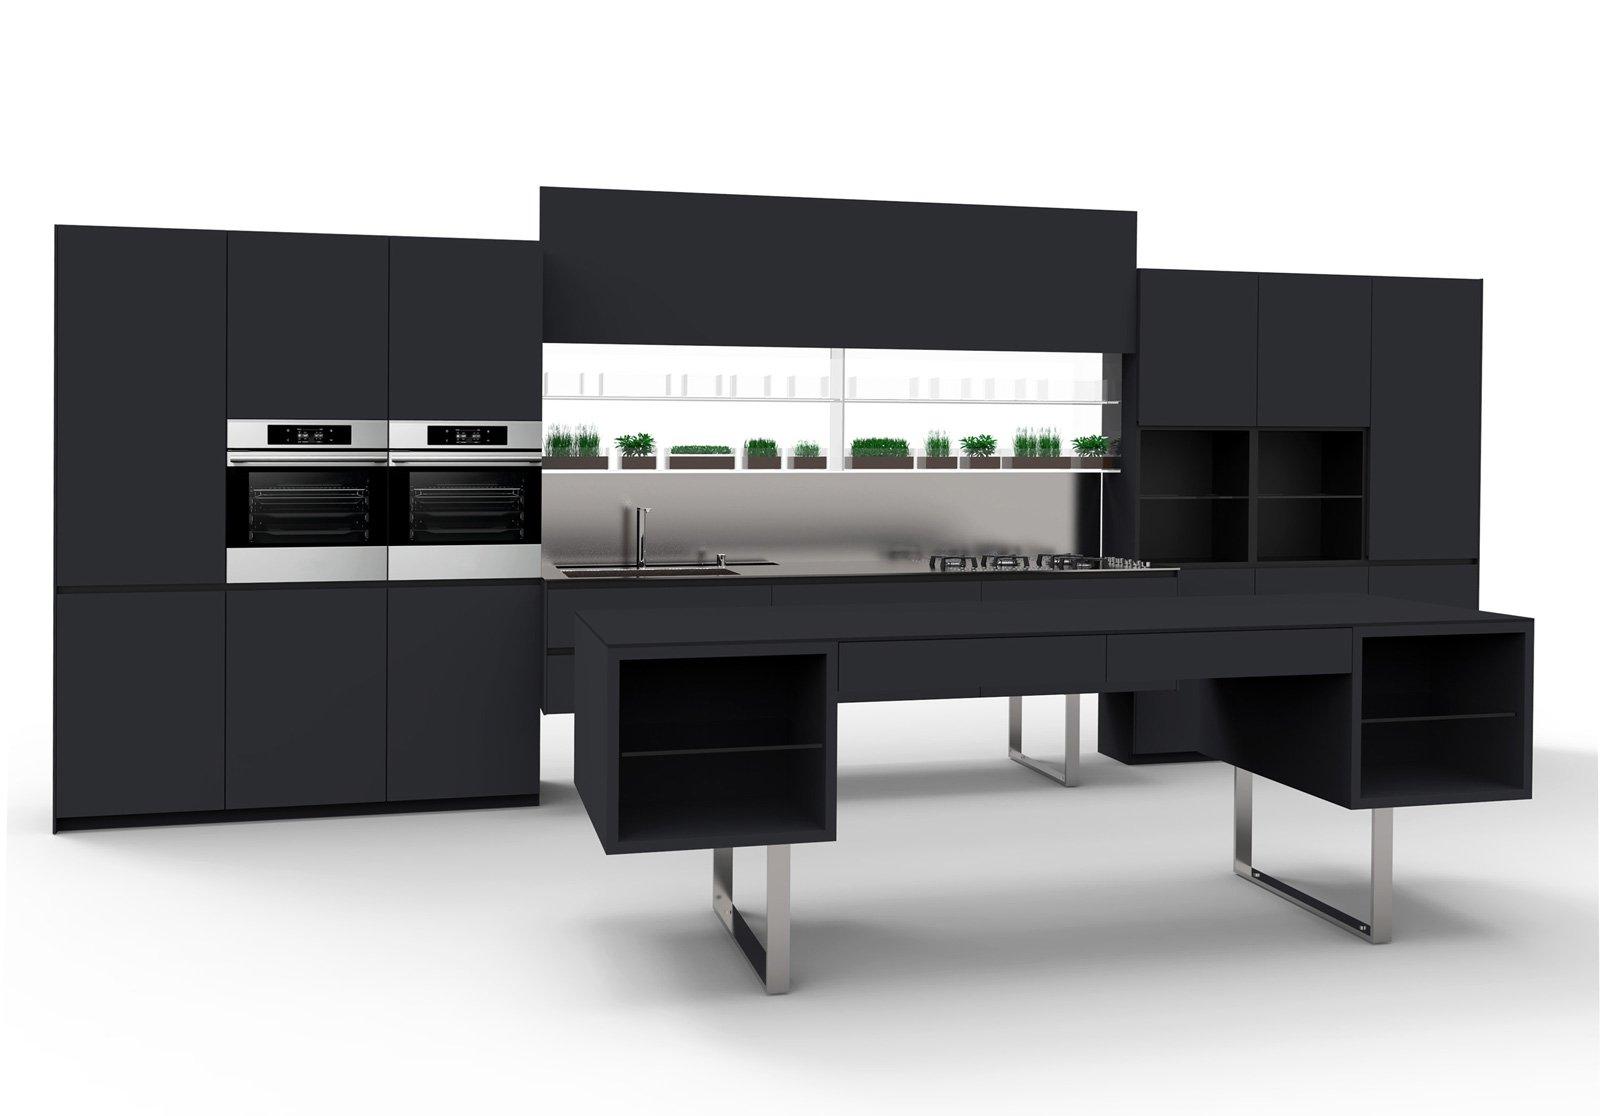 Stunning Carrelli Cucina Mondo Convenienza Ideas - Skilifts.us ...